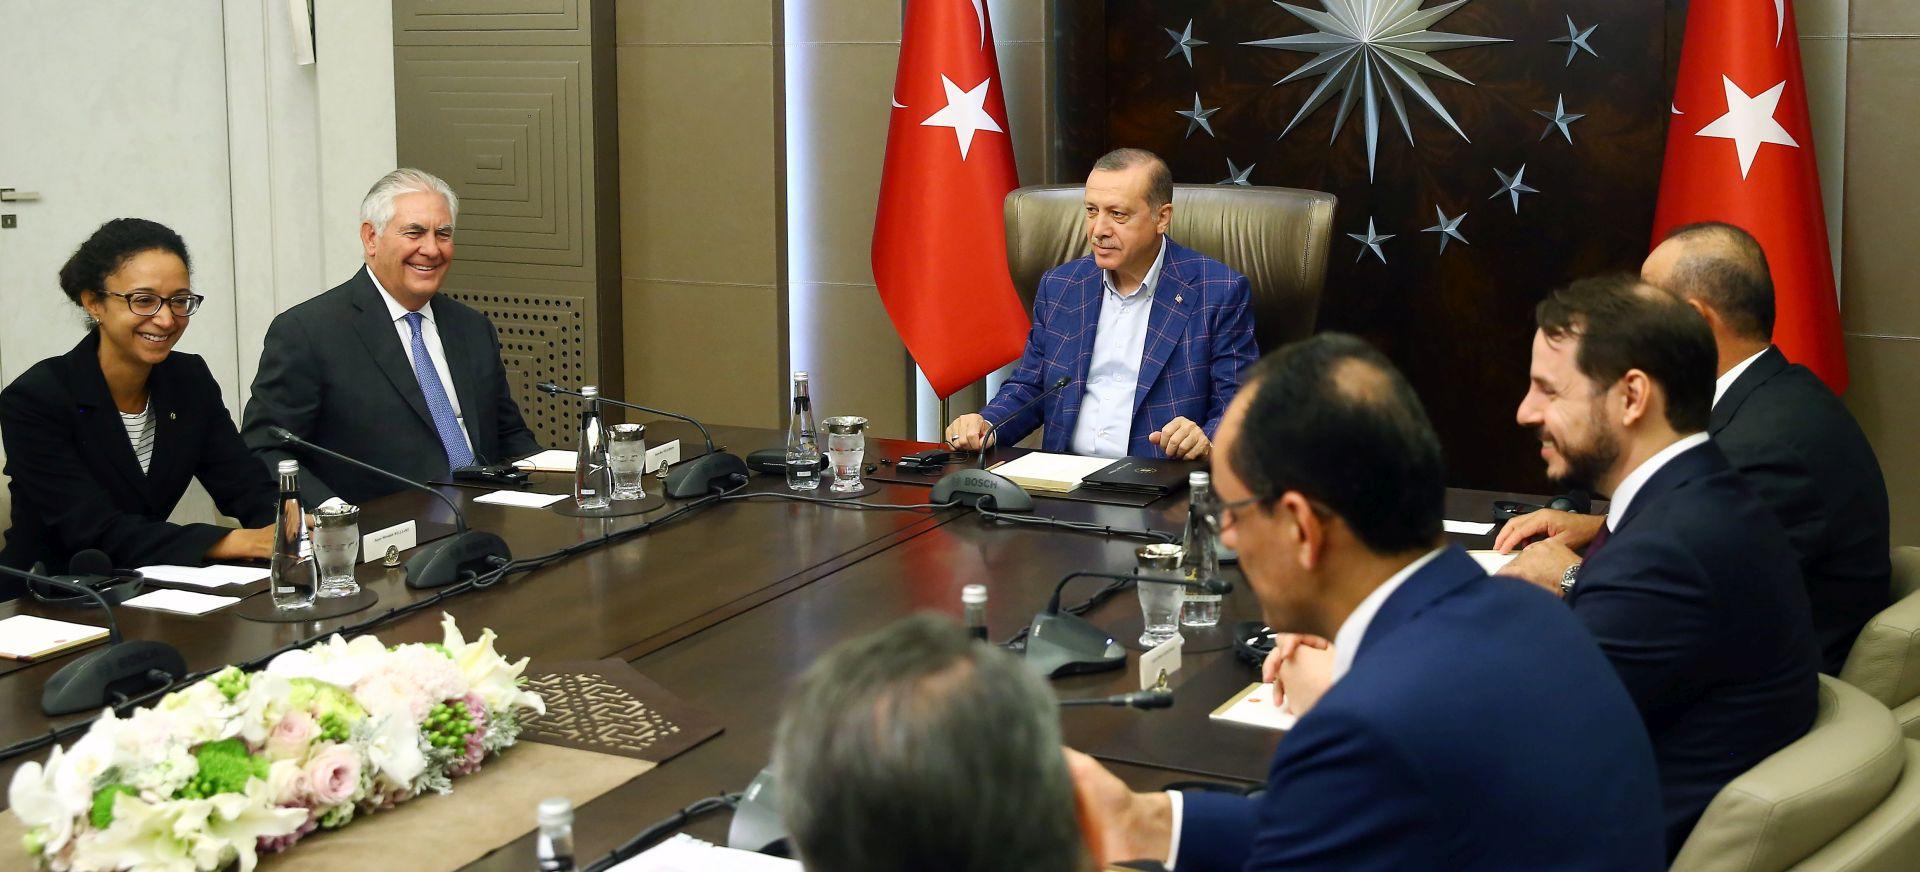 Tillerson u Istanbulu pohvalio hrabrost turskog naroda